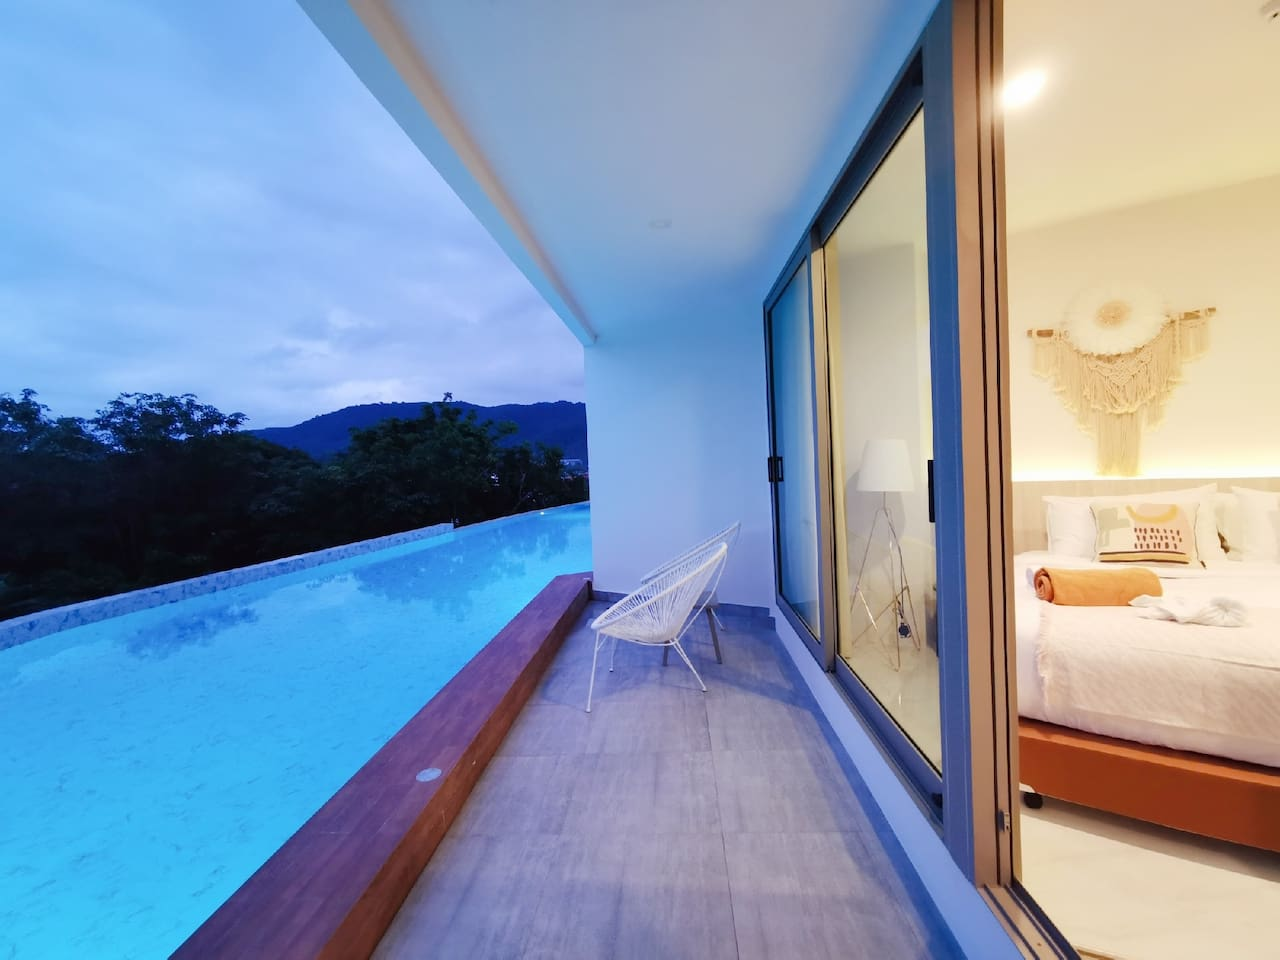 晚上开灯后的泳池和房间 room view in the night time